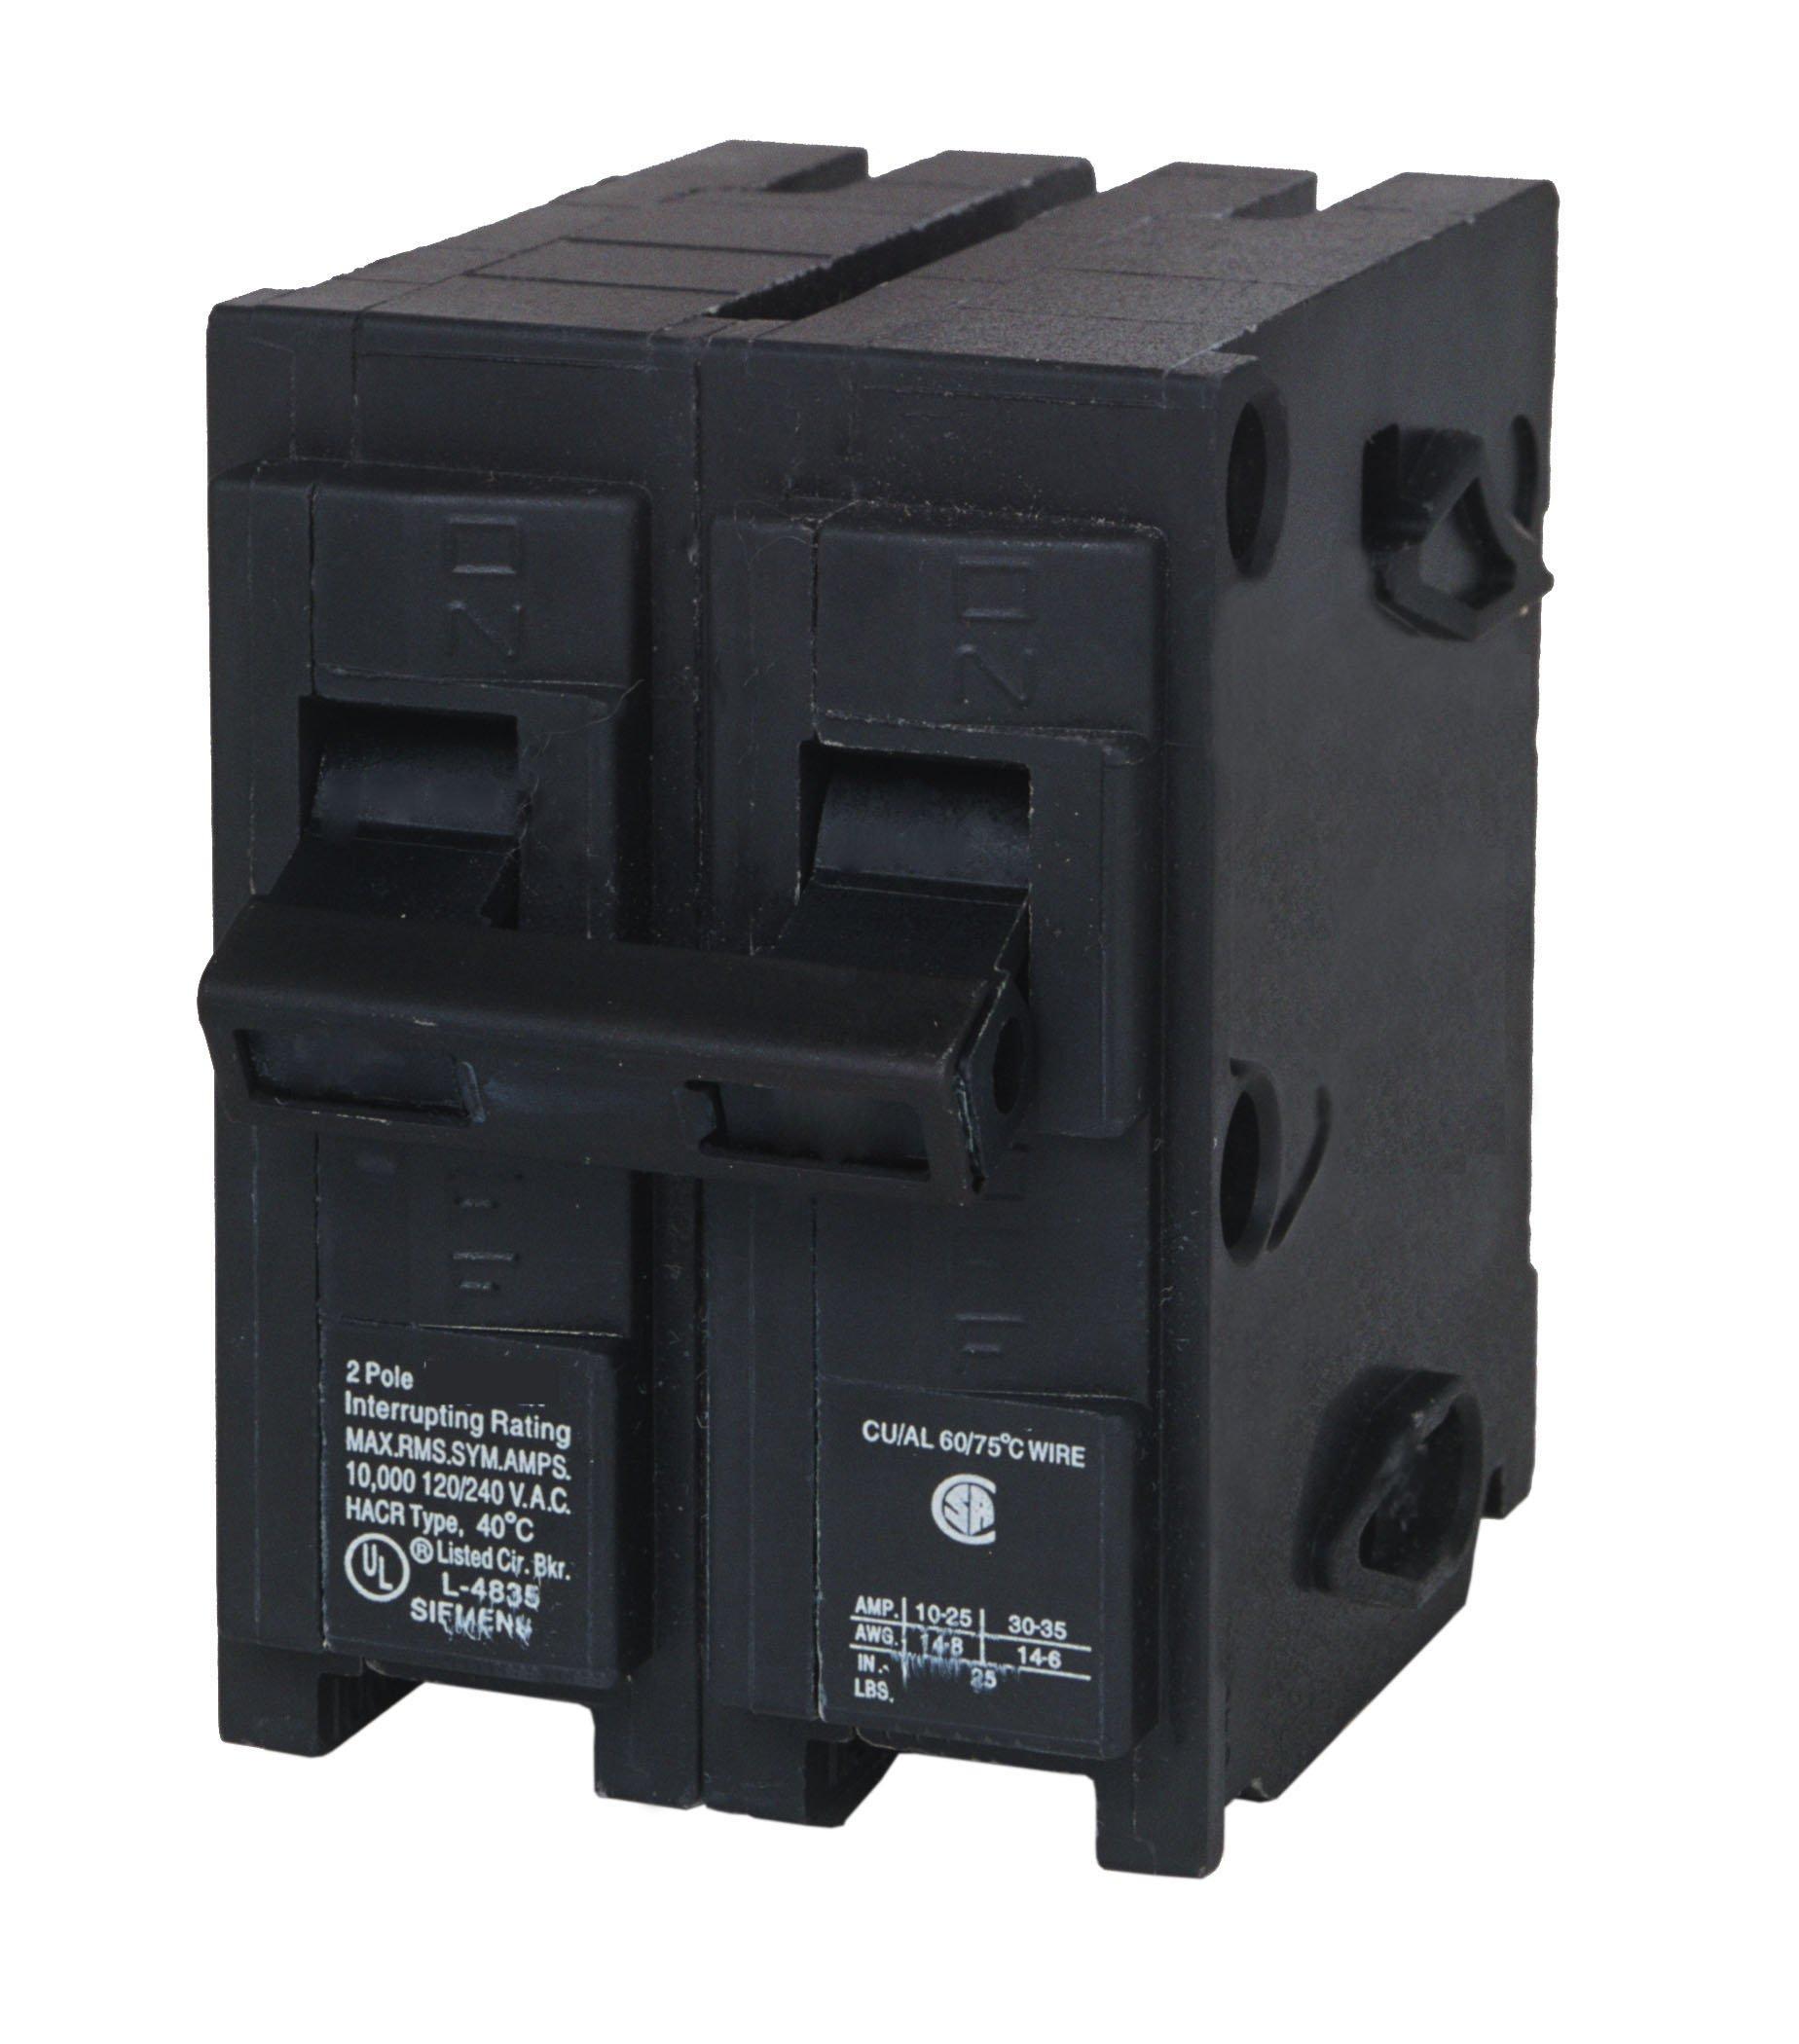 Q2125H 125-Amp Double Pole 22kA Type QPH Circuit Breaker by SIEMENS